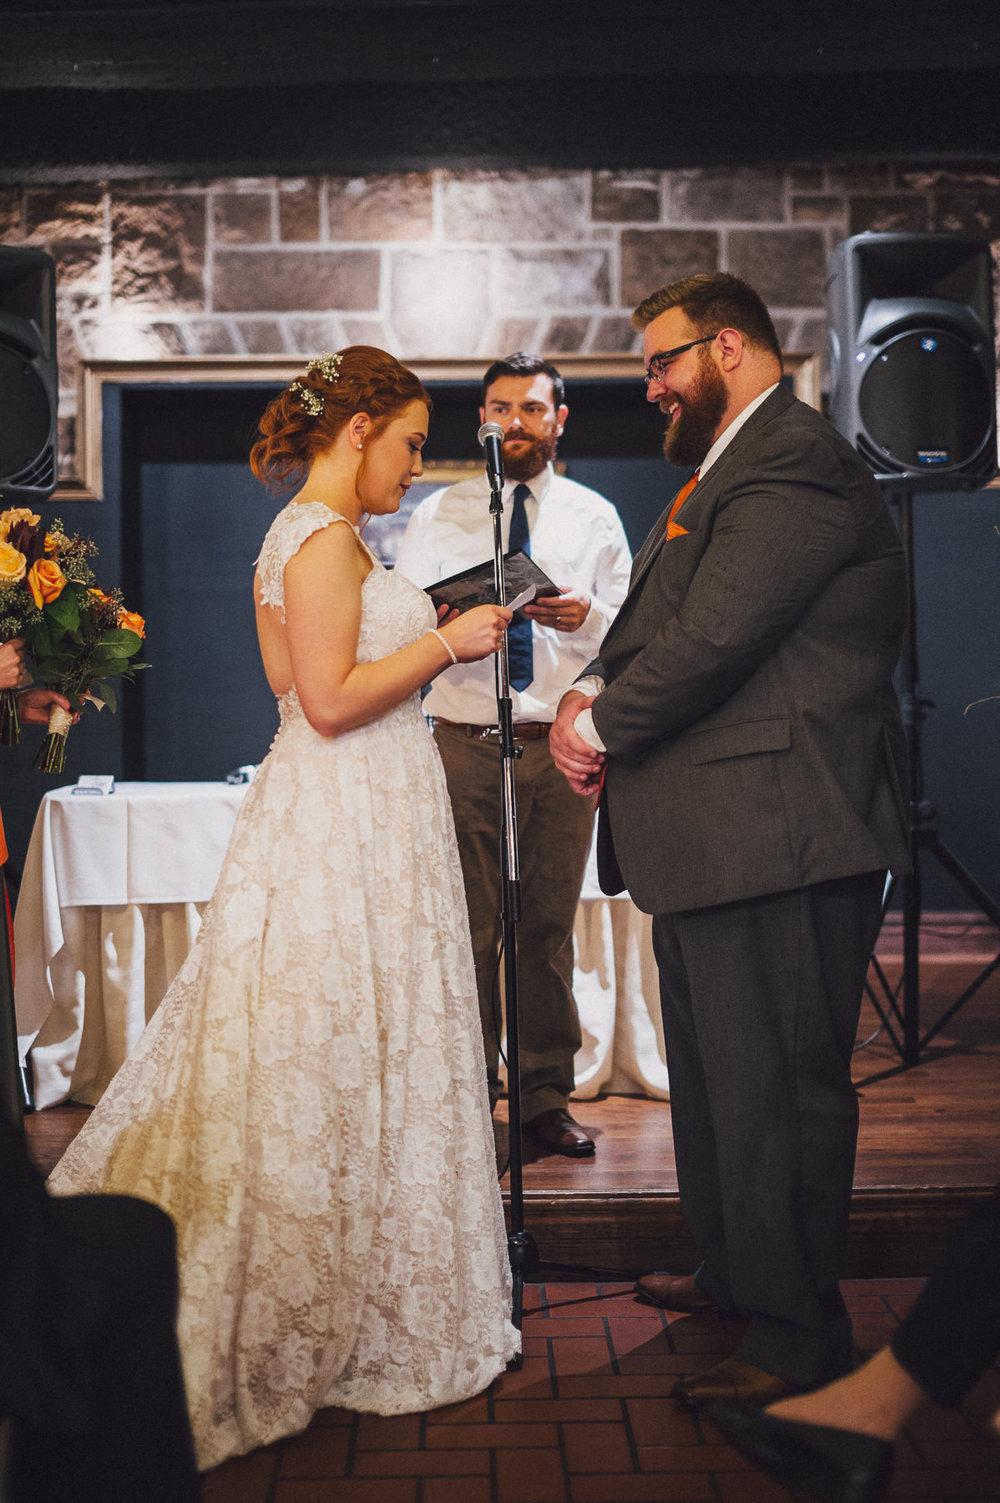 breighton-and-basette-photography-copyrighted-image-blog-amanda-and-eric-wedding-138.jpg